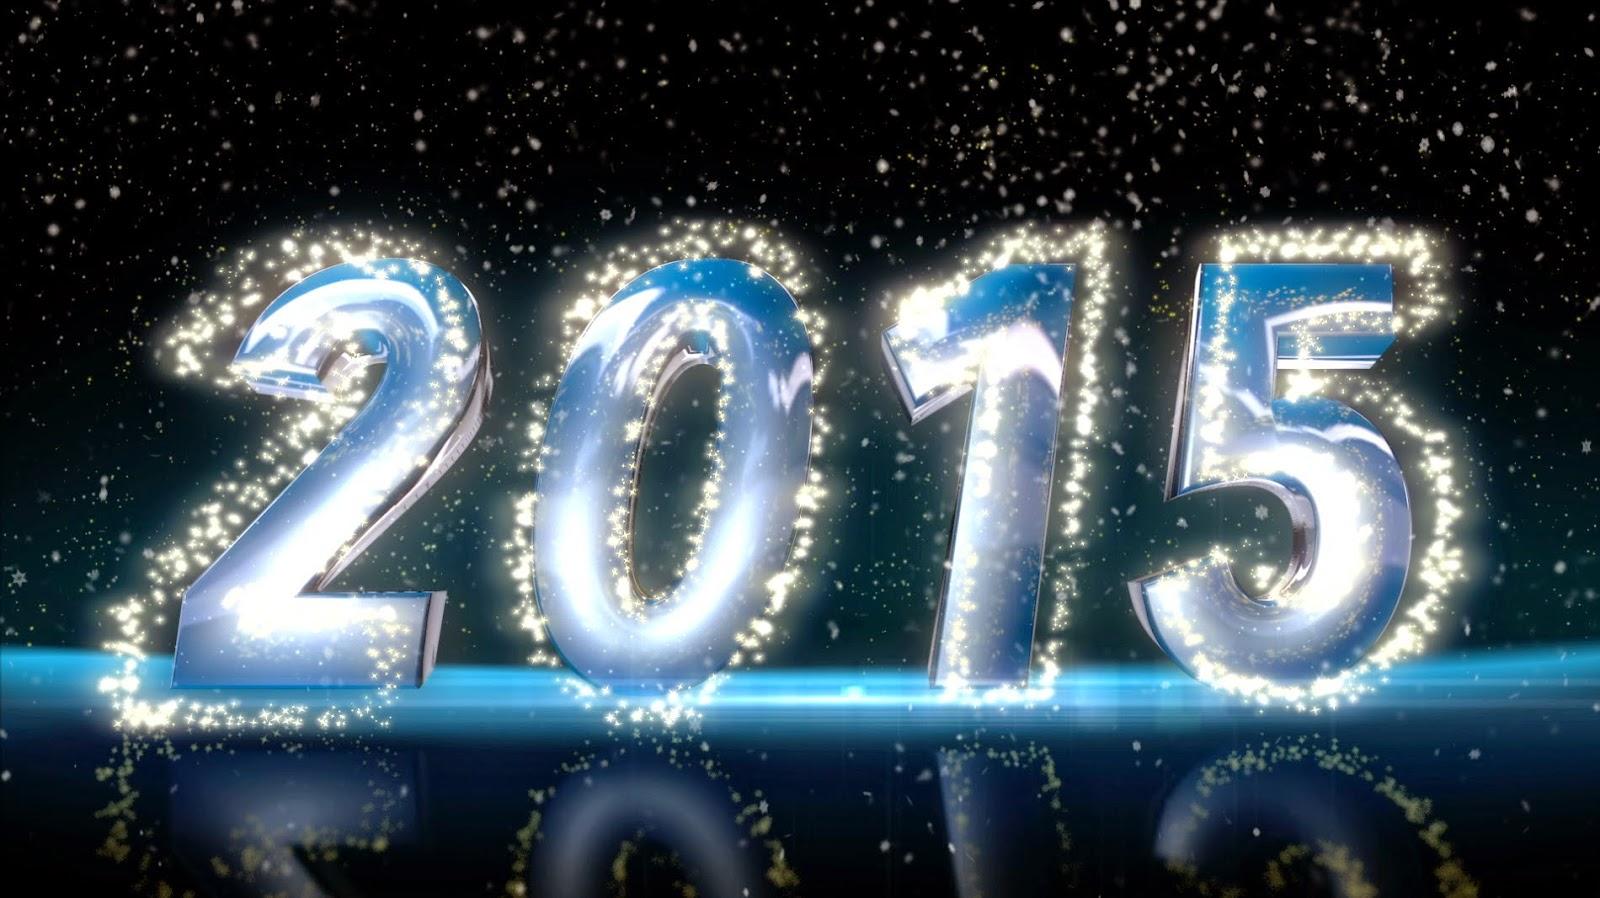 New Year 2015 Wallpaper